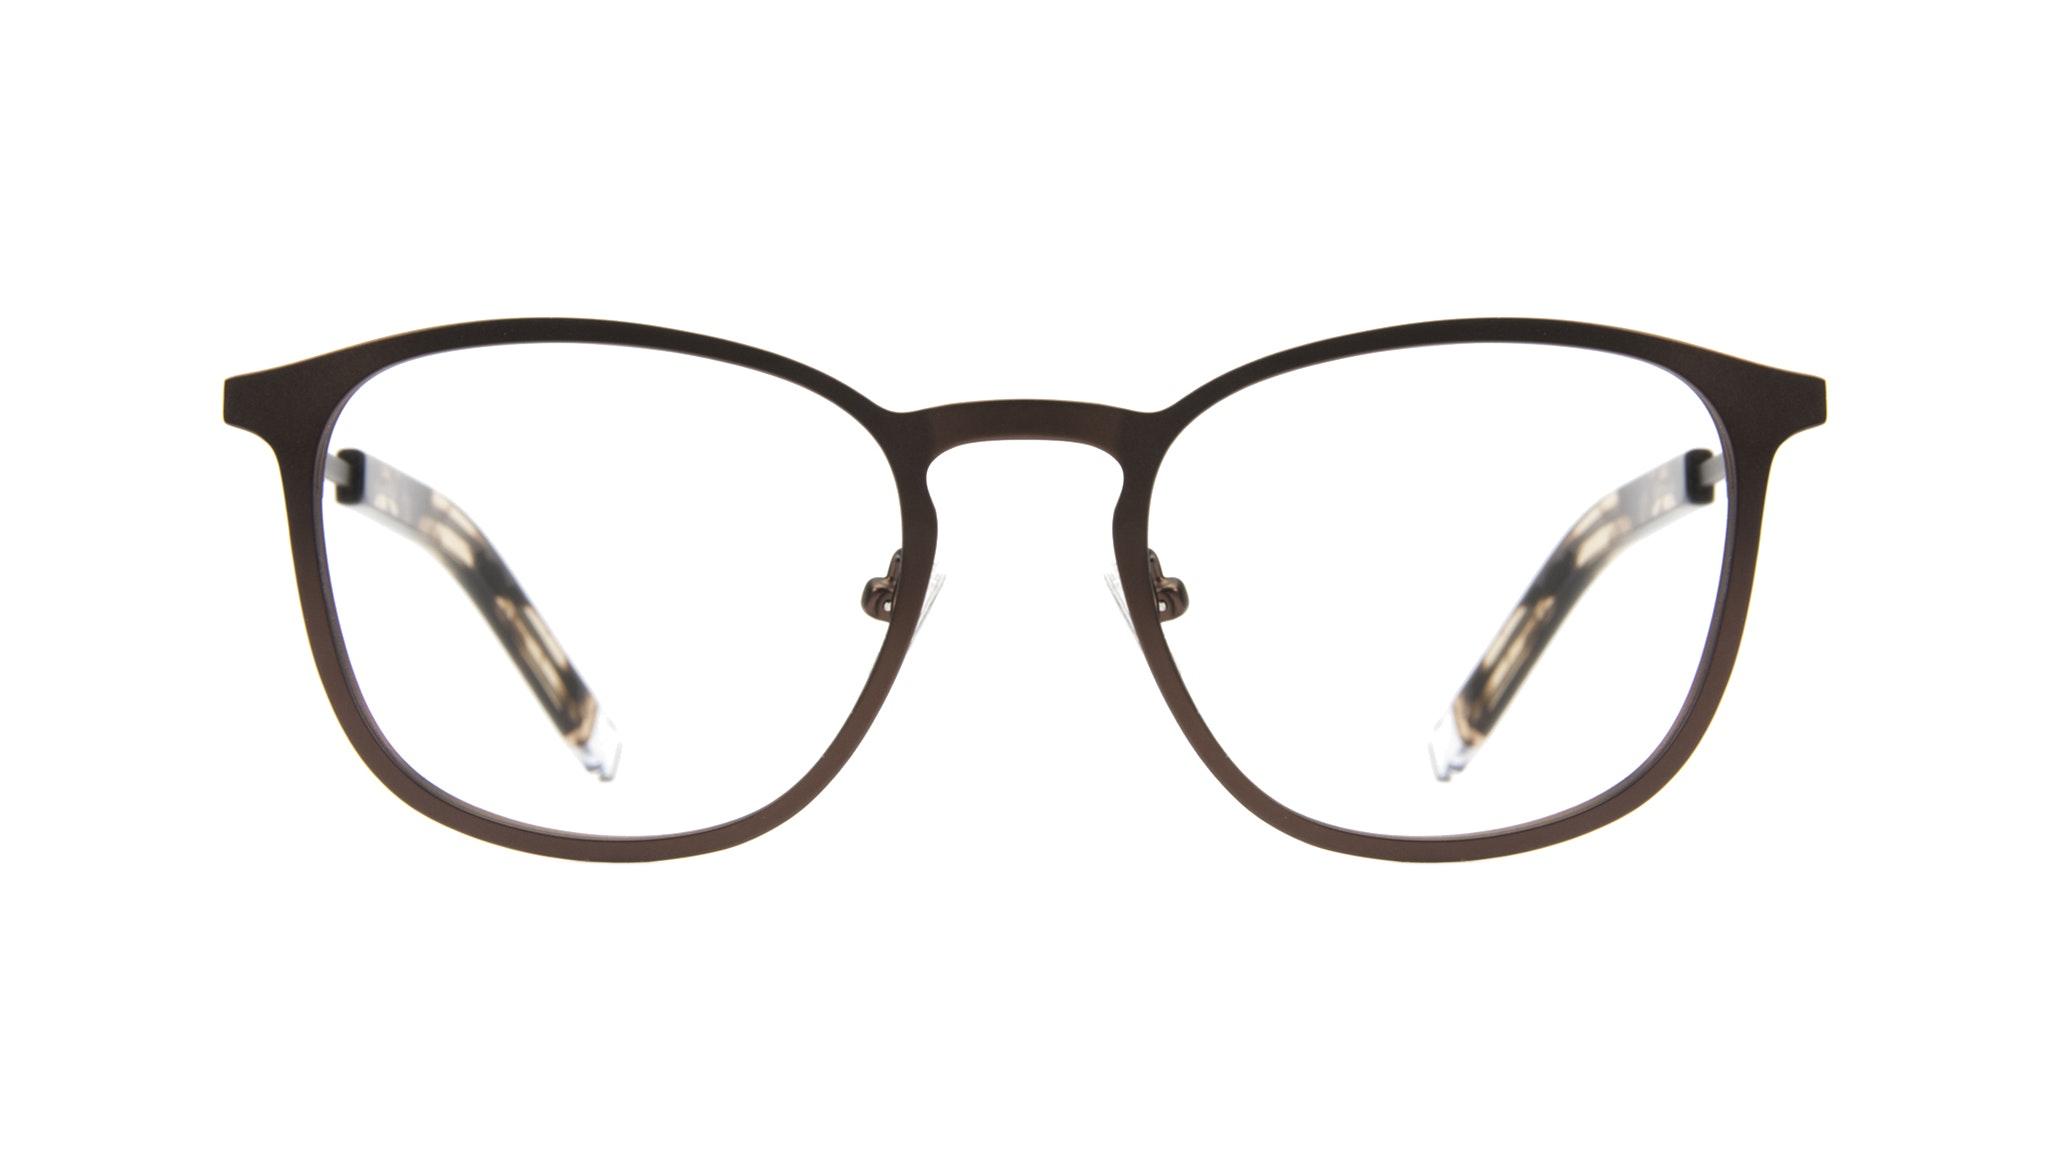 Affordable Fashion Glasses Rectangle Square Eyeglasses Men Core Mud